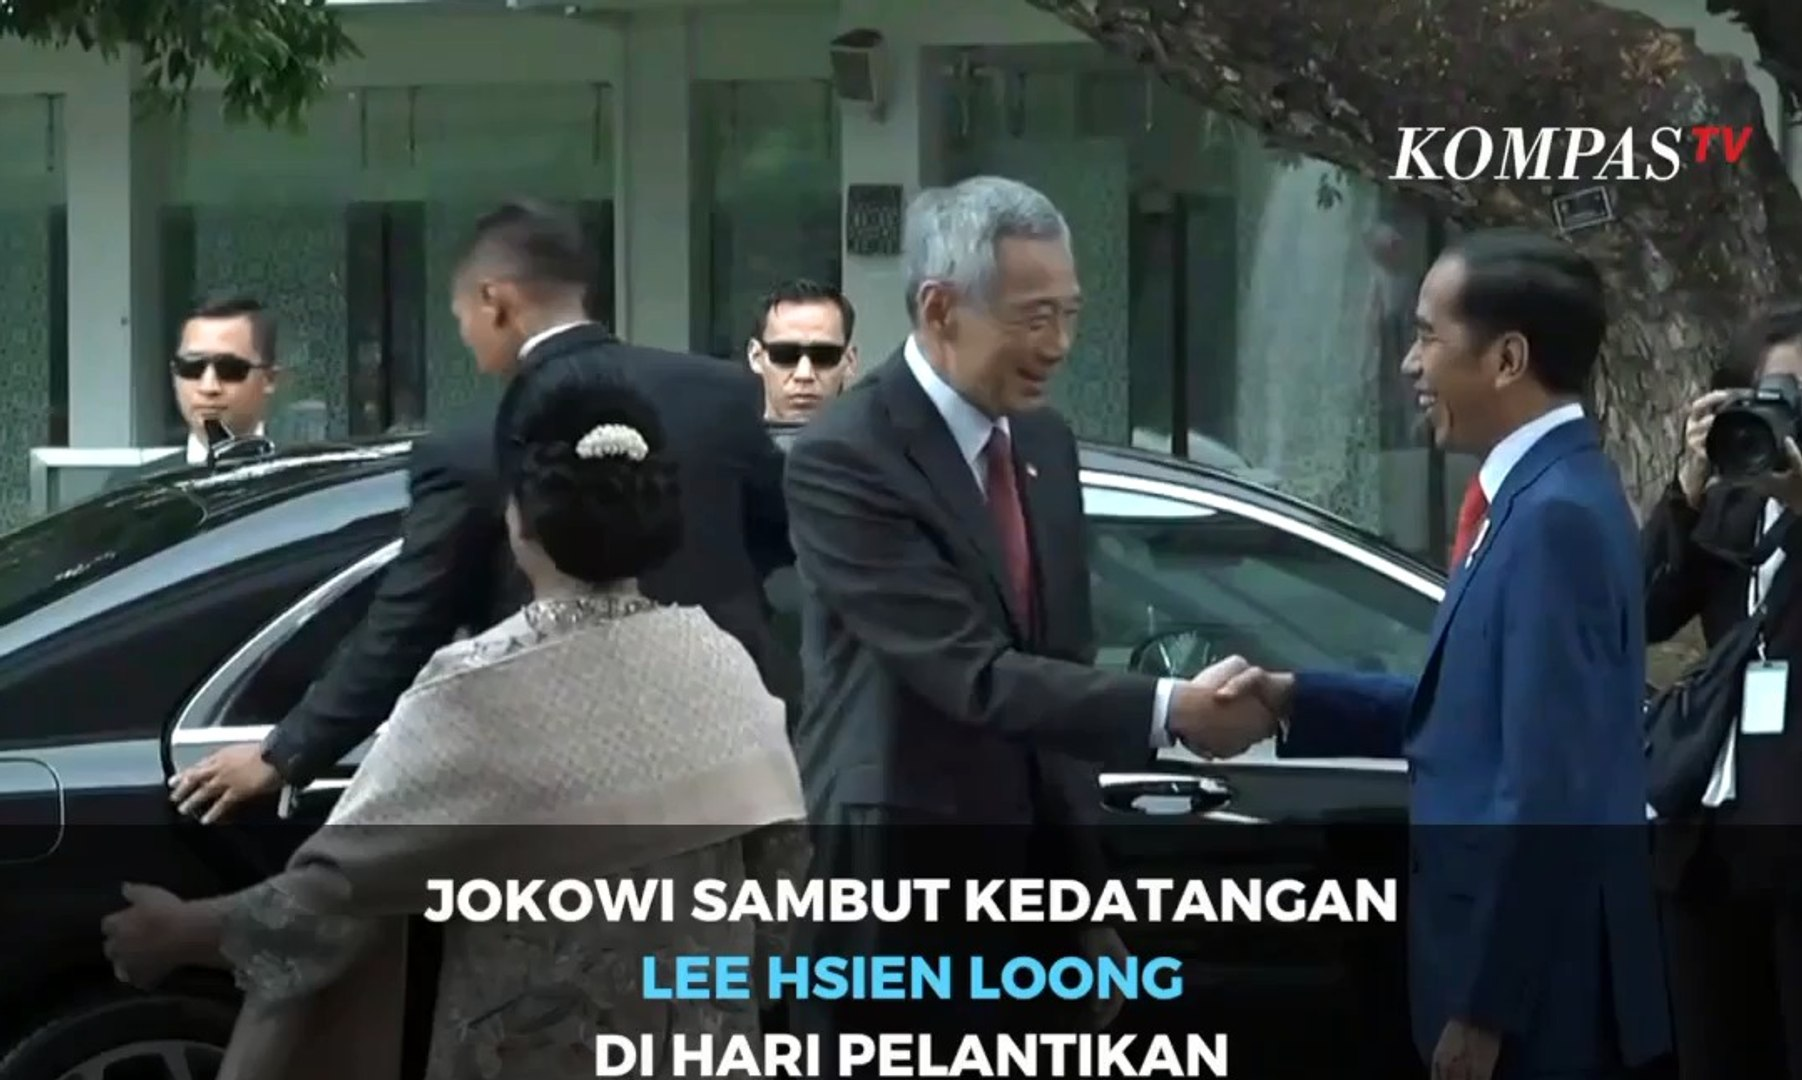 Jokowi Sambut Kedatangan Lee Hsien Loong di Hari Pelantikan